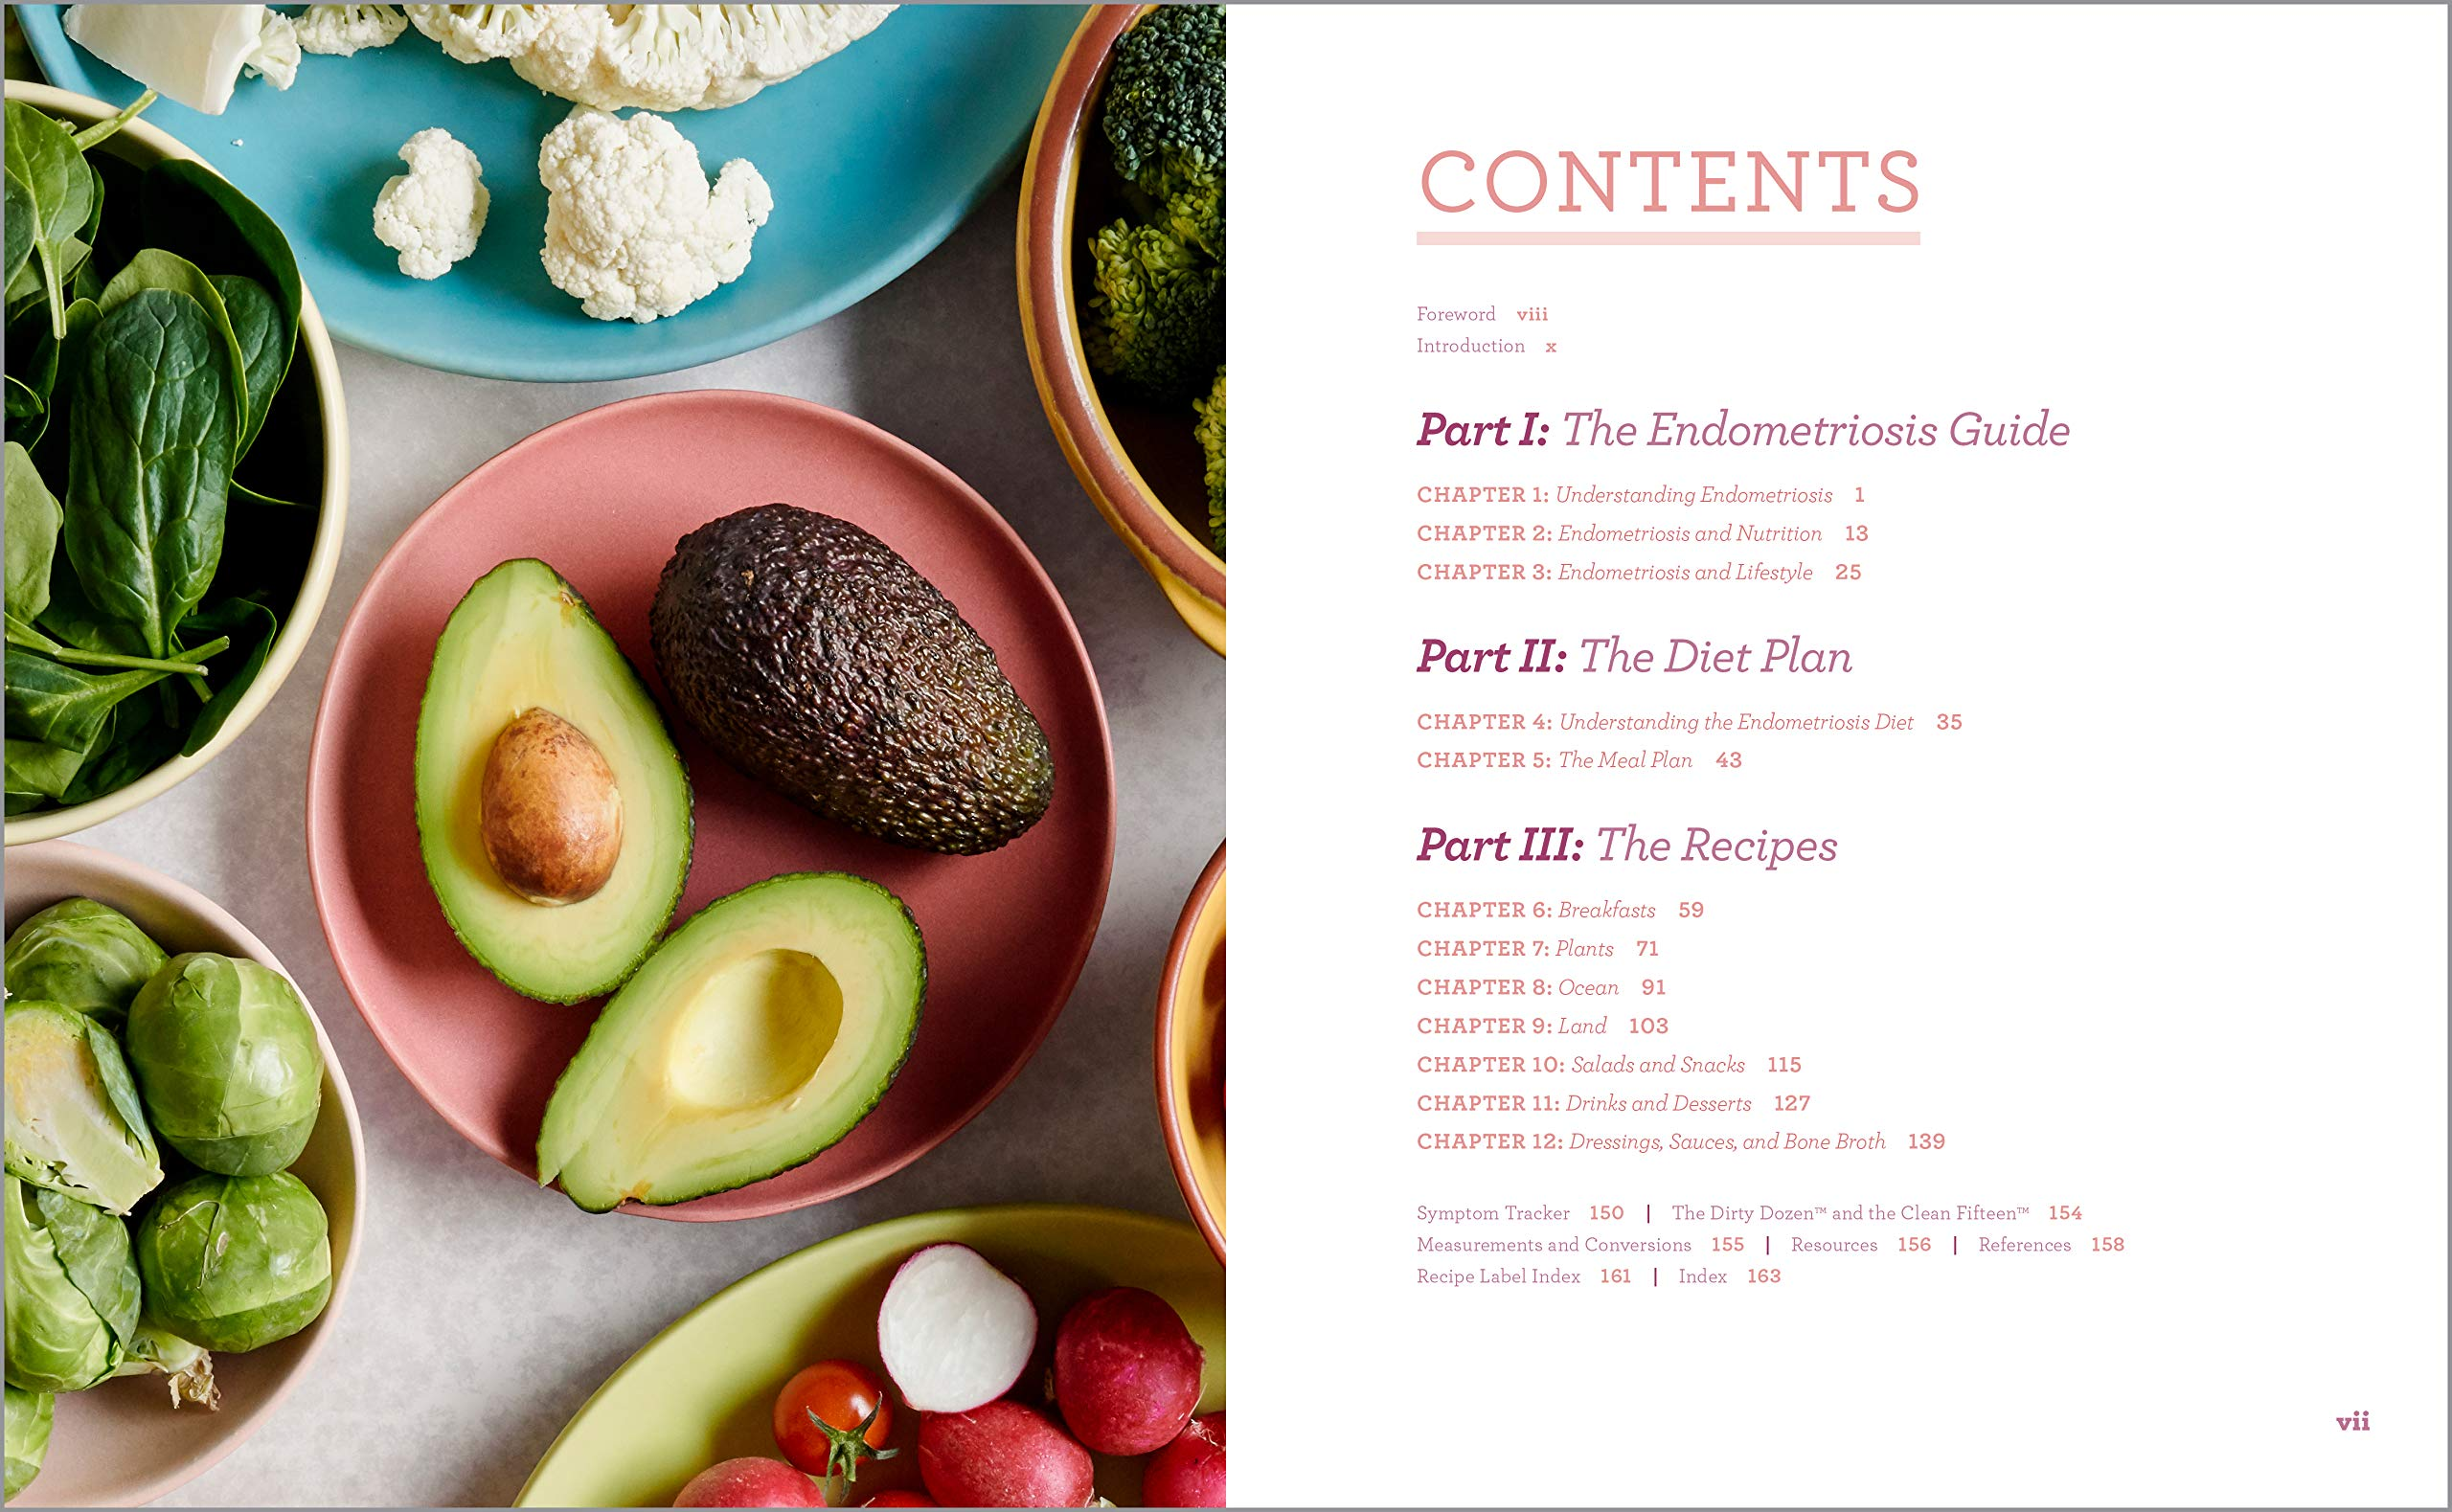 The 4 Week Endometriosis Diet Plan 75 Healing Recipes To Relieve Symptoms And Regain Control Of Your Life Amazon De Edmonds Katie Fremdsprachige Bucher